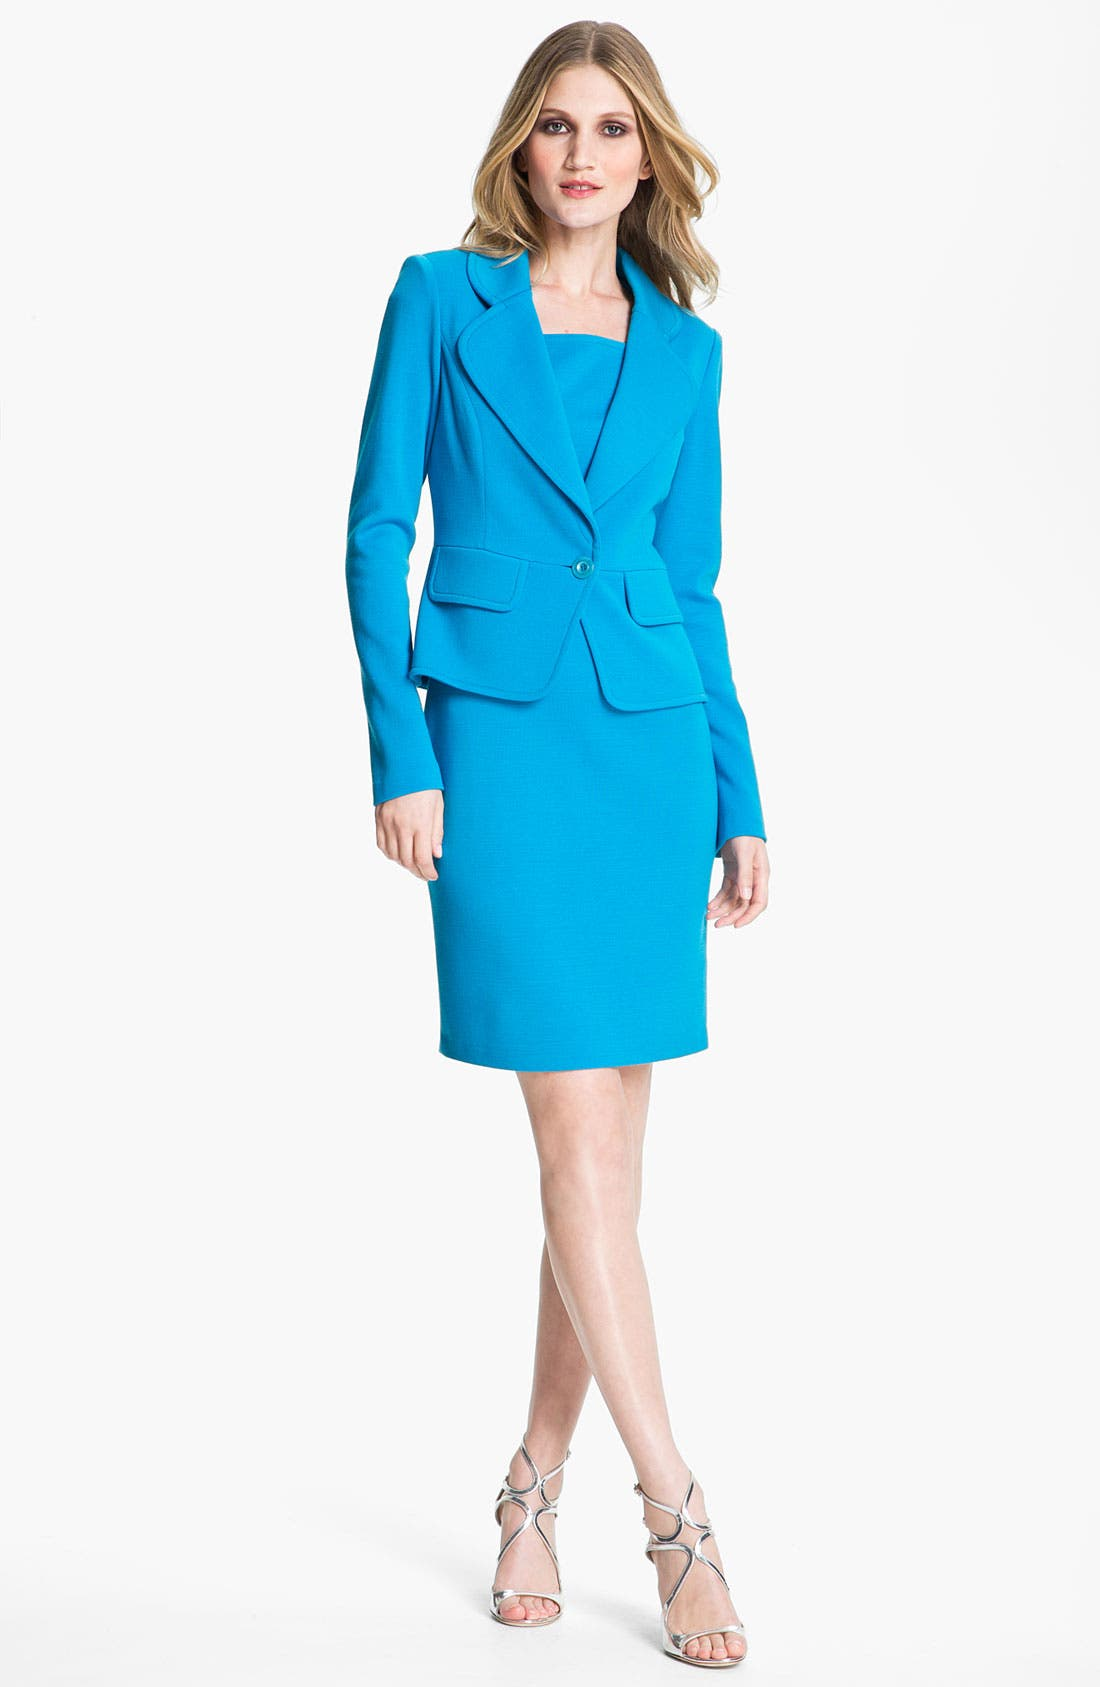 Main Image - St. John Collection Jacket & Sheath Dress